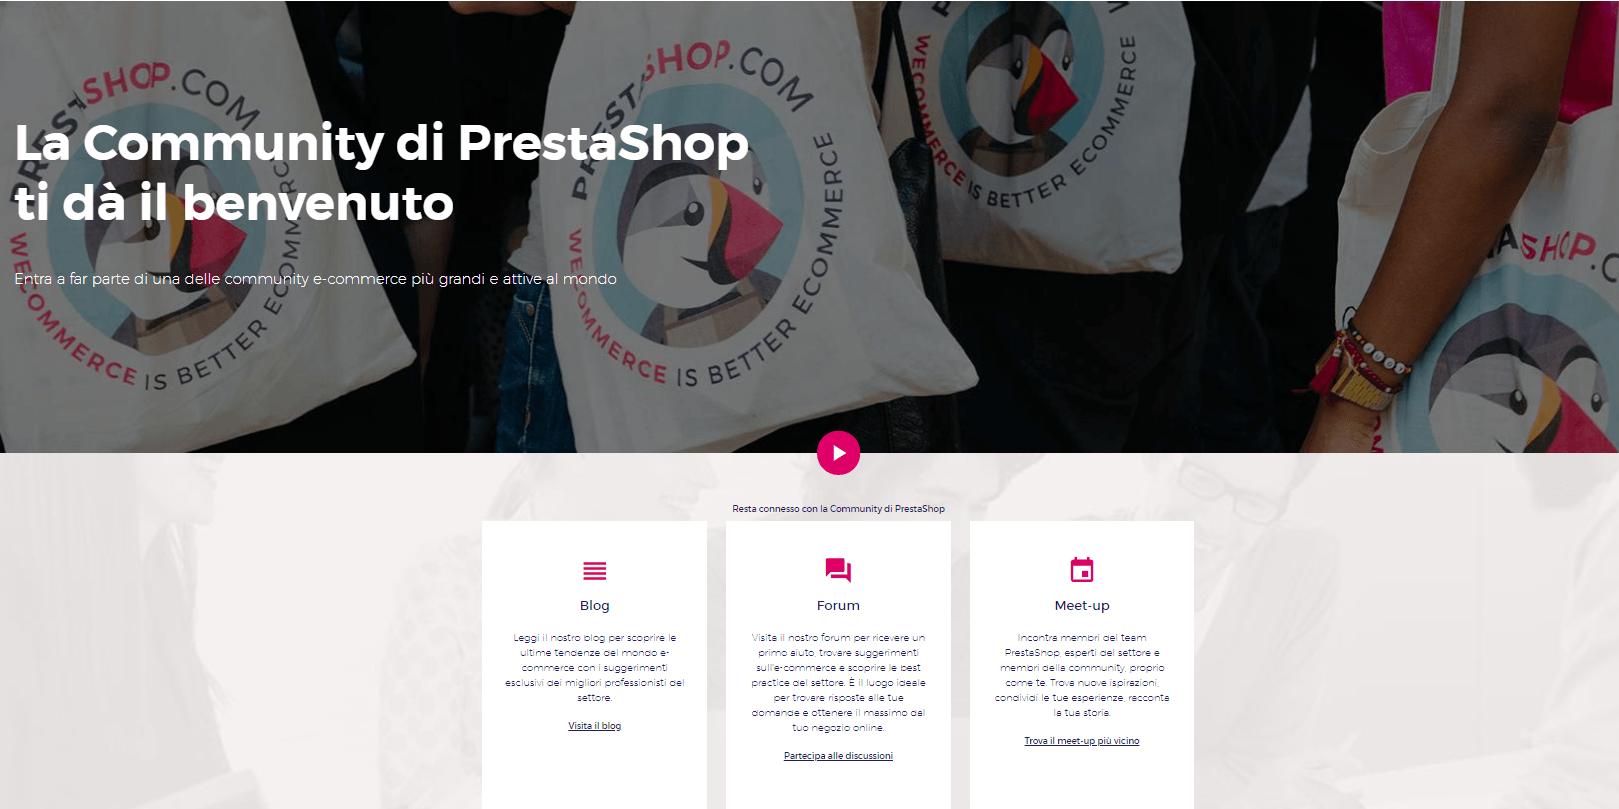 Community prestashop- preventivo